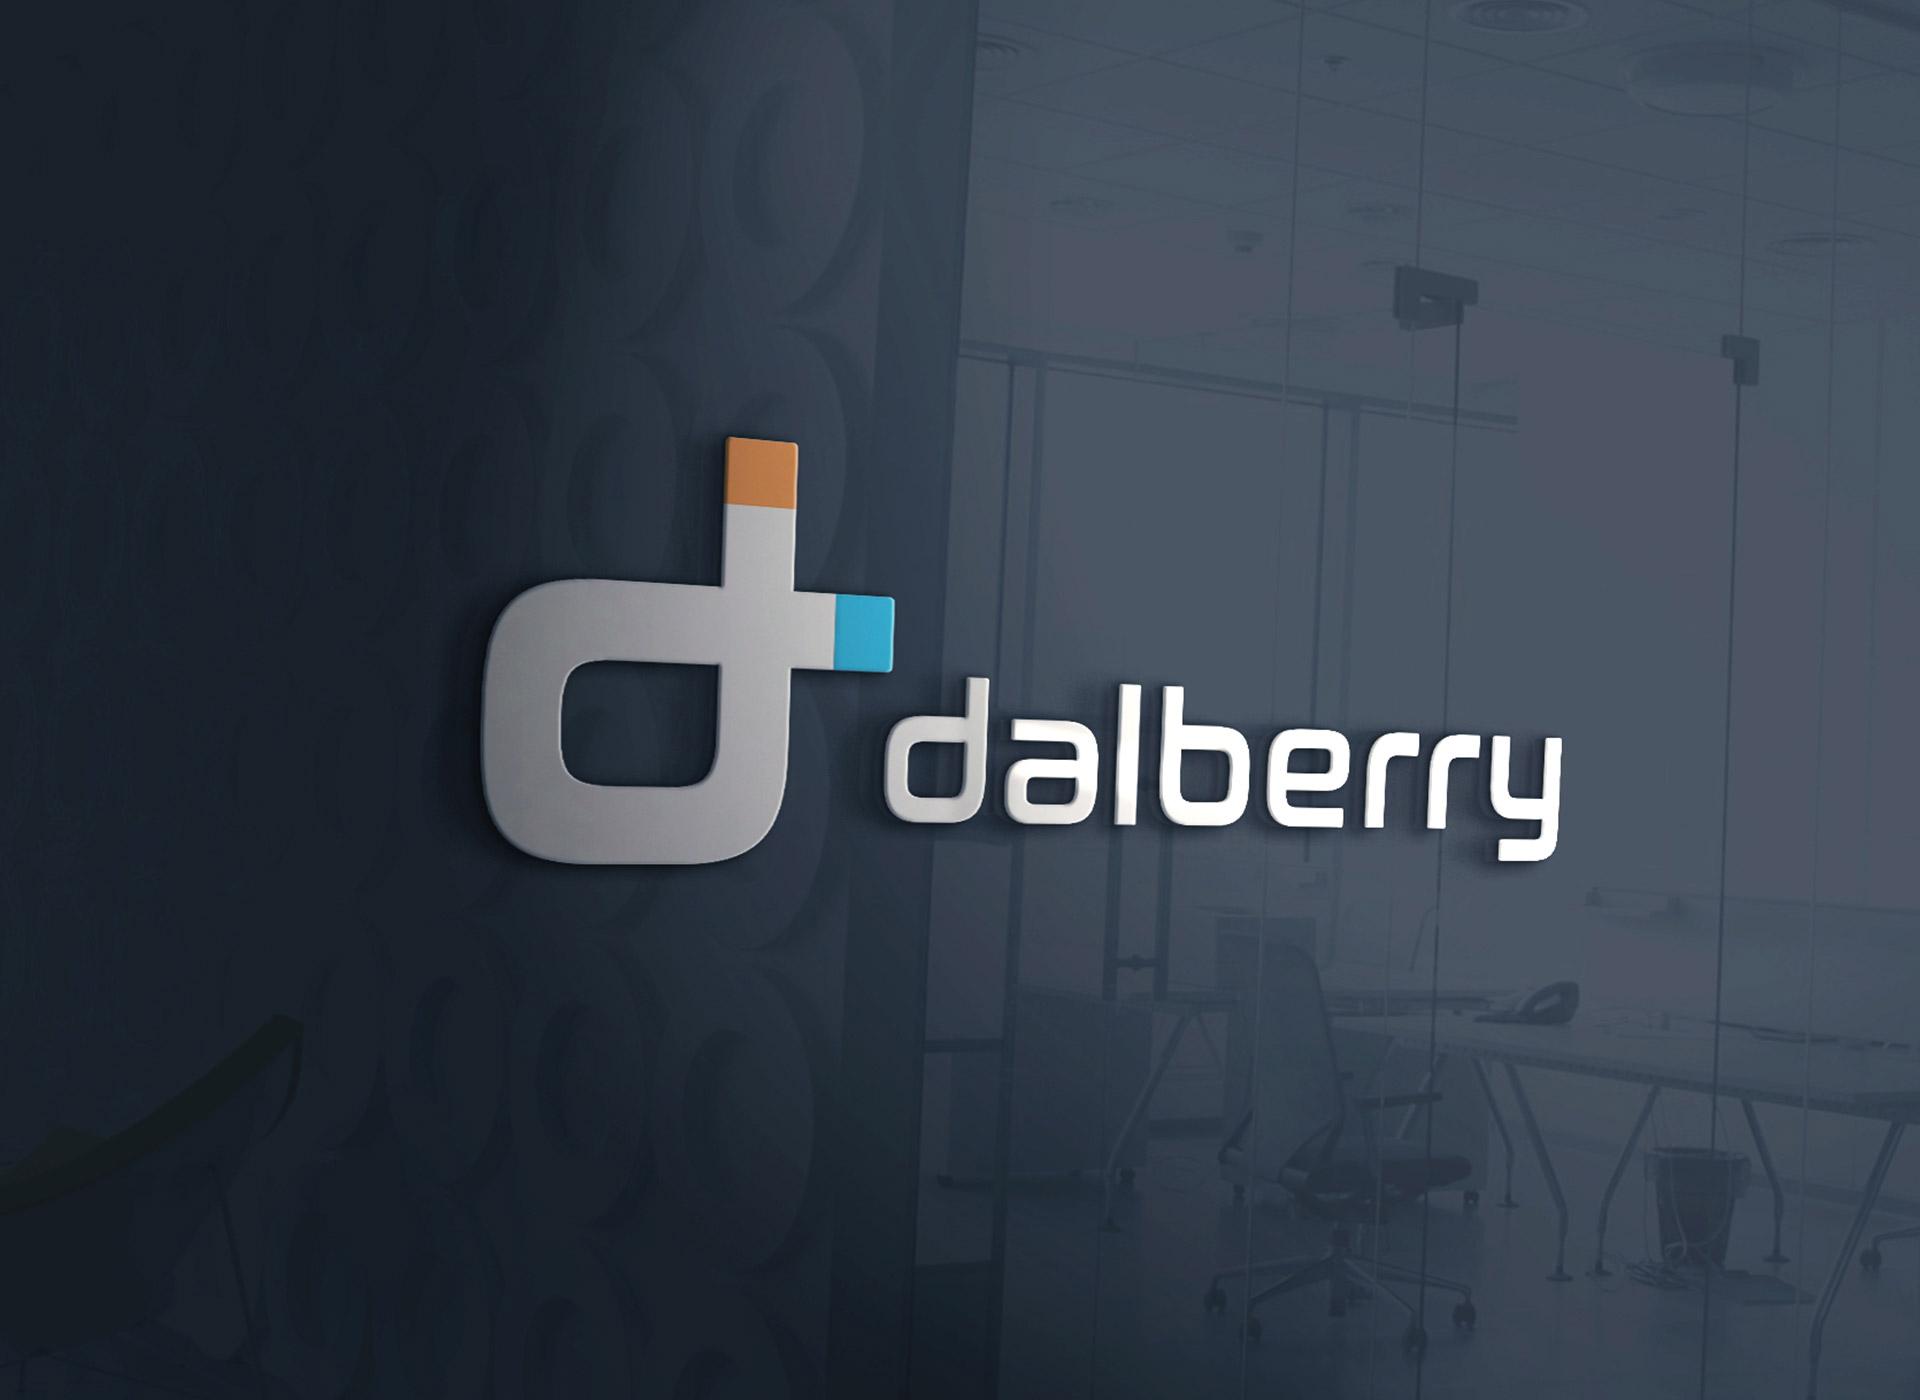 branding inovativ logo dalberry negru perete